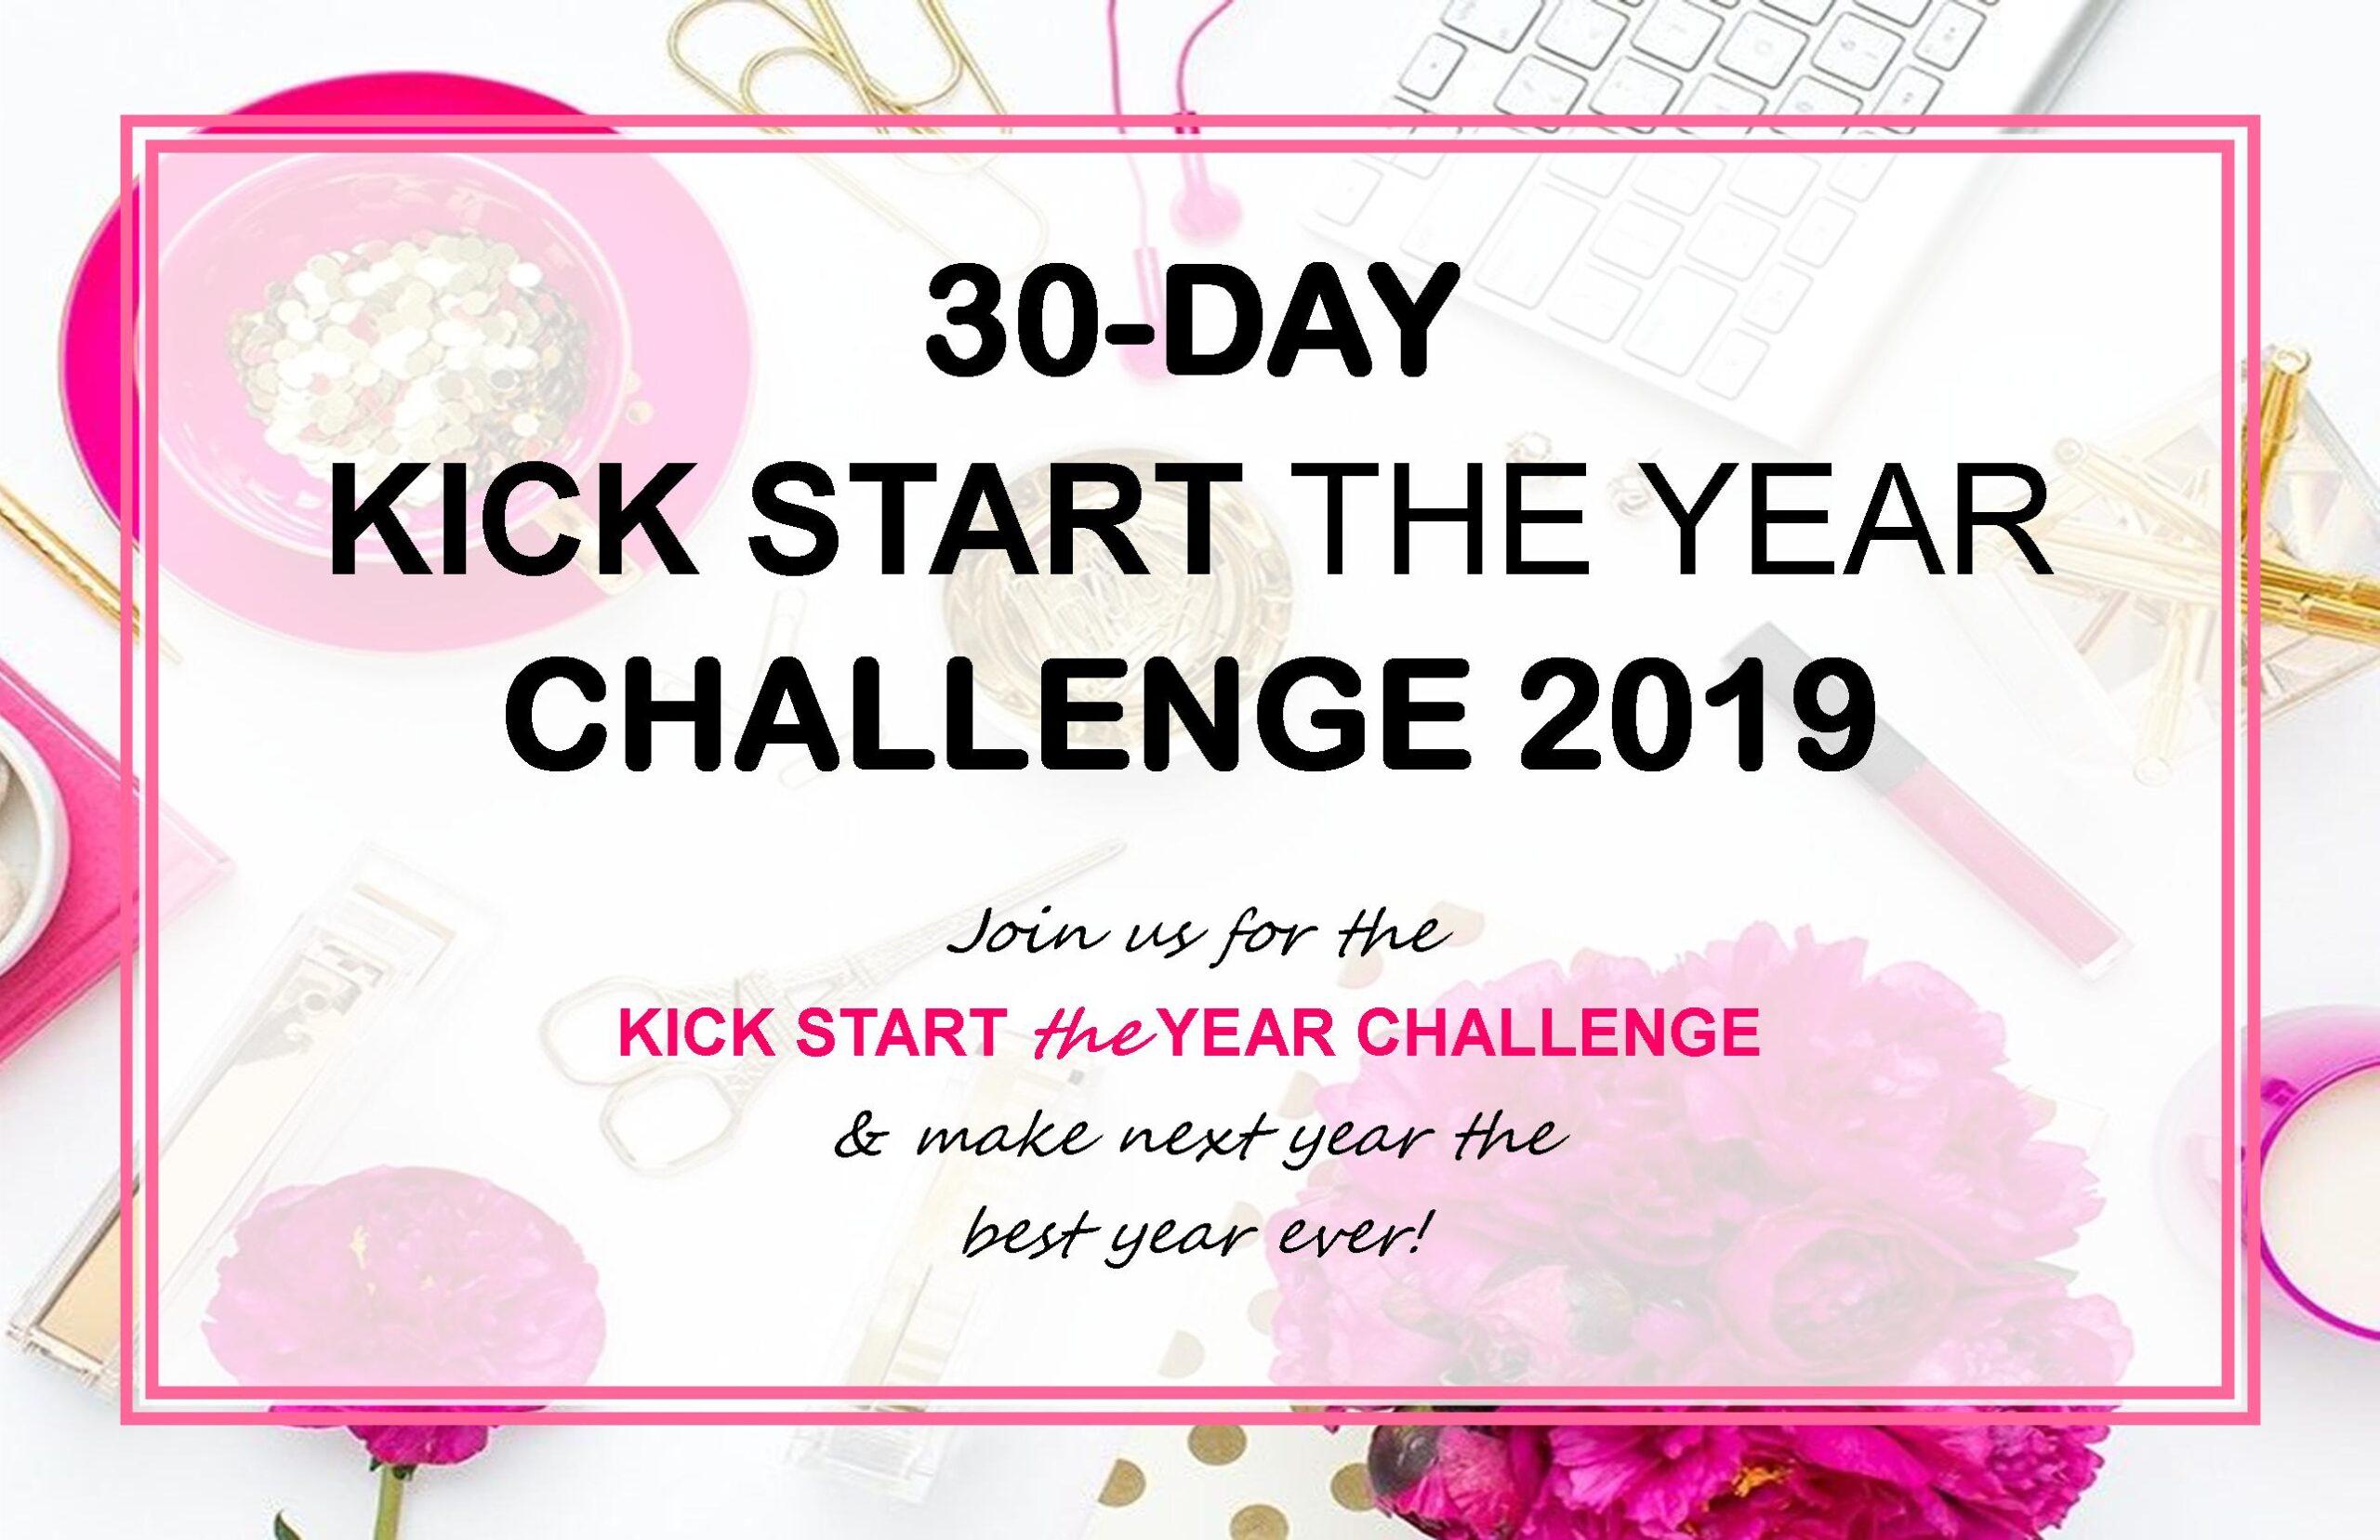 30-DAY KICK START THE YEAR CHALLENGE 2019